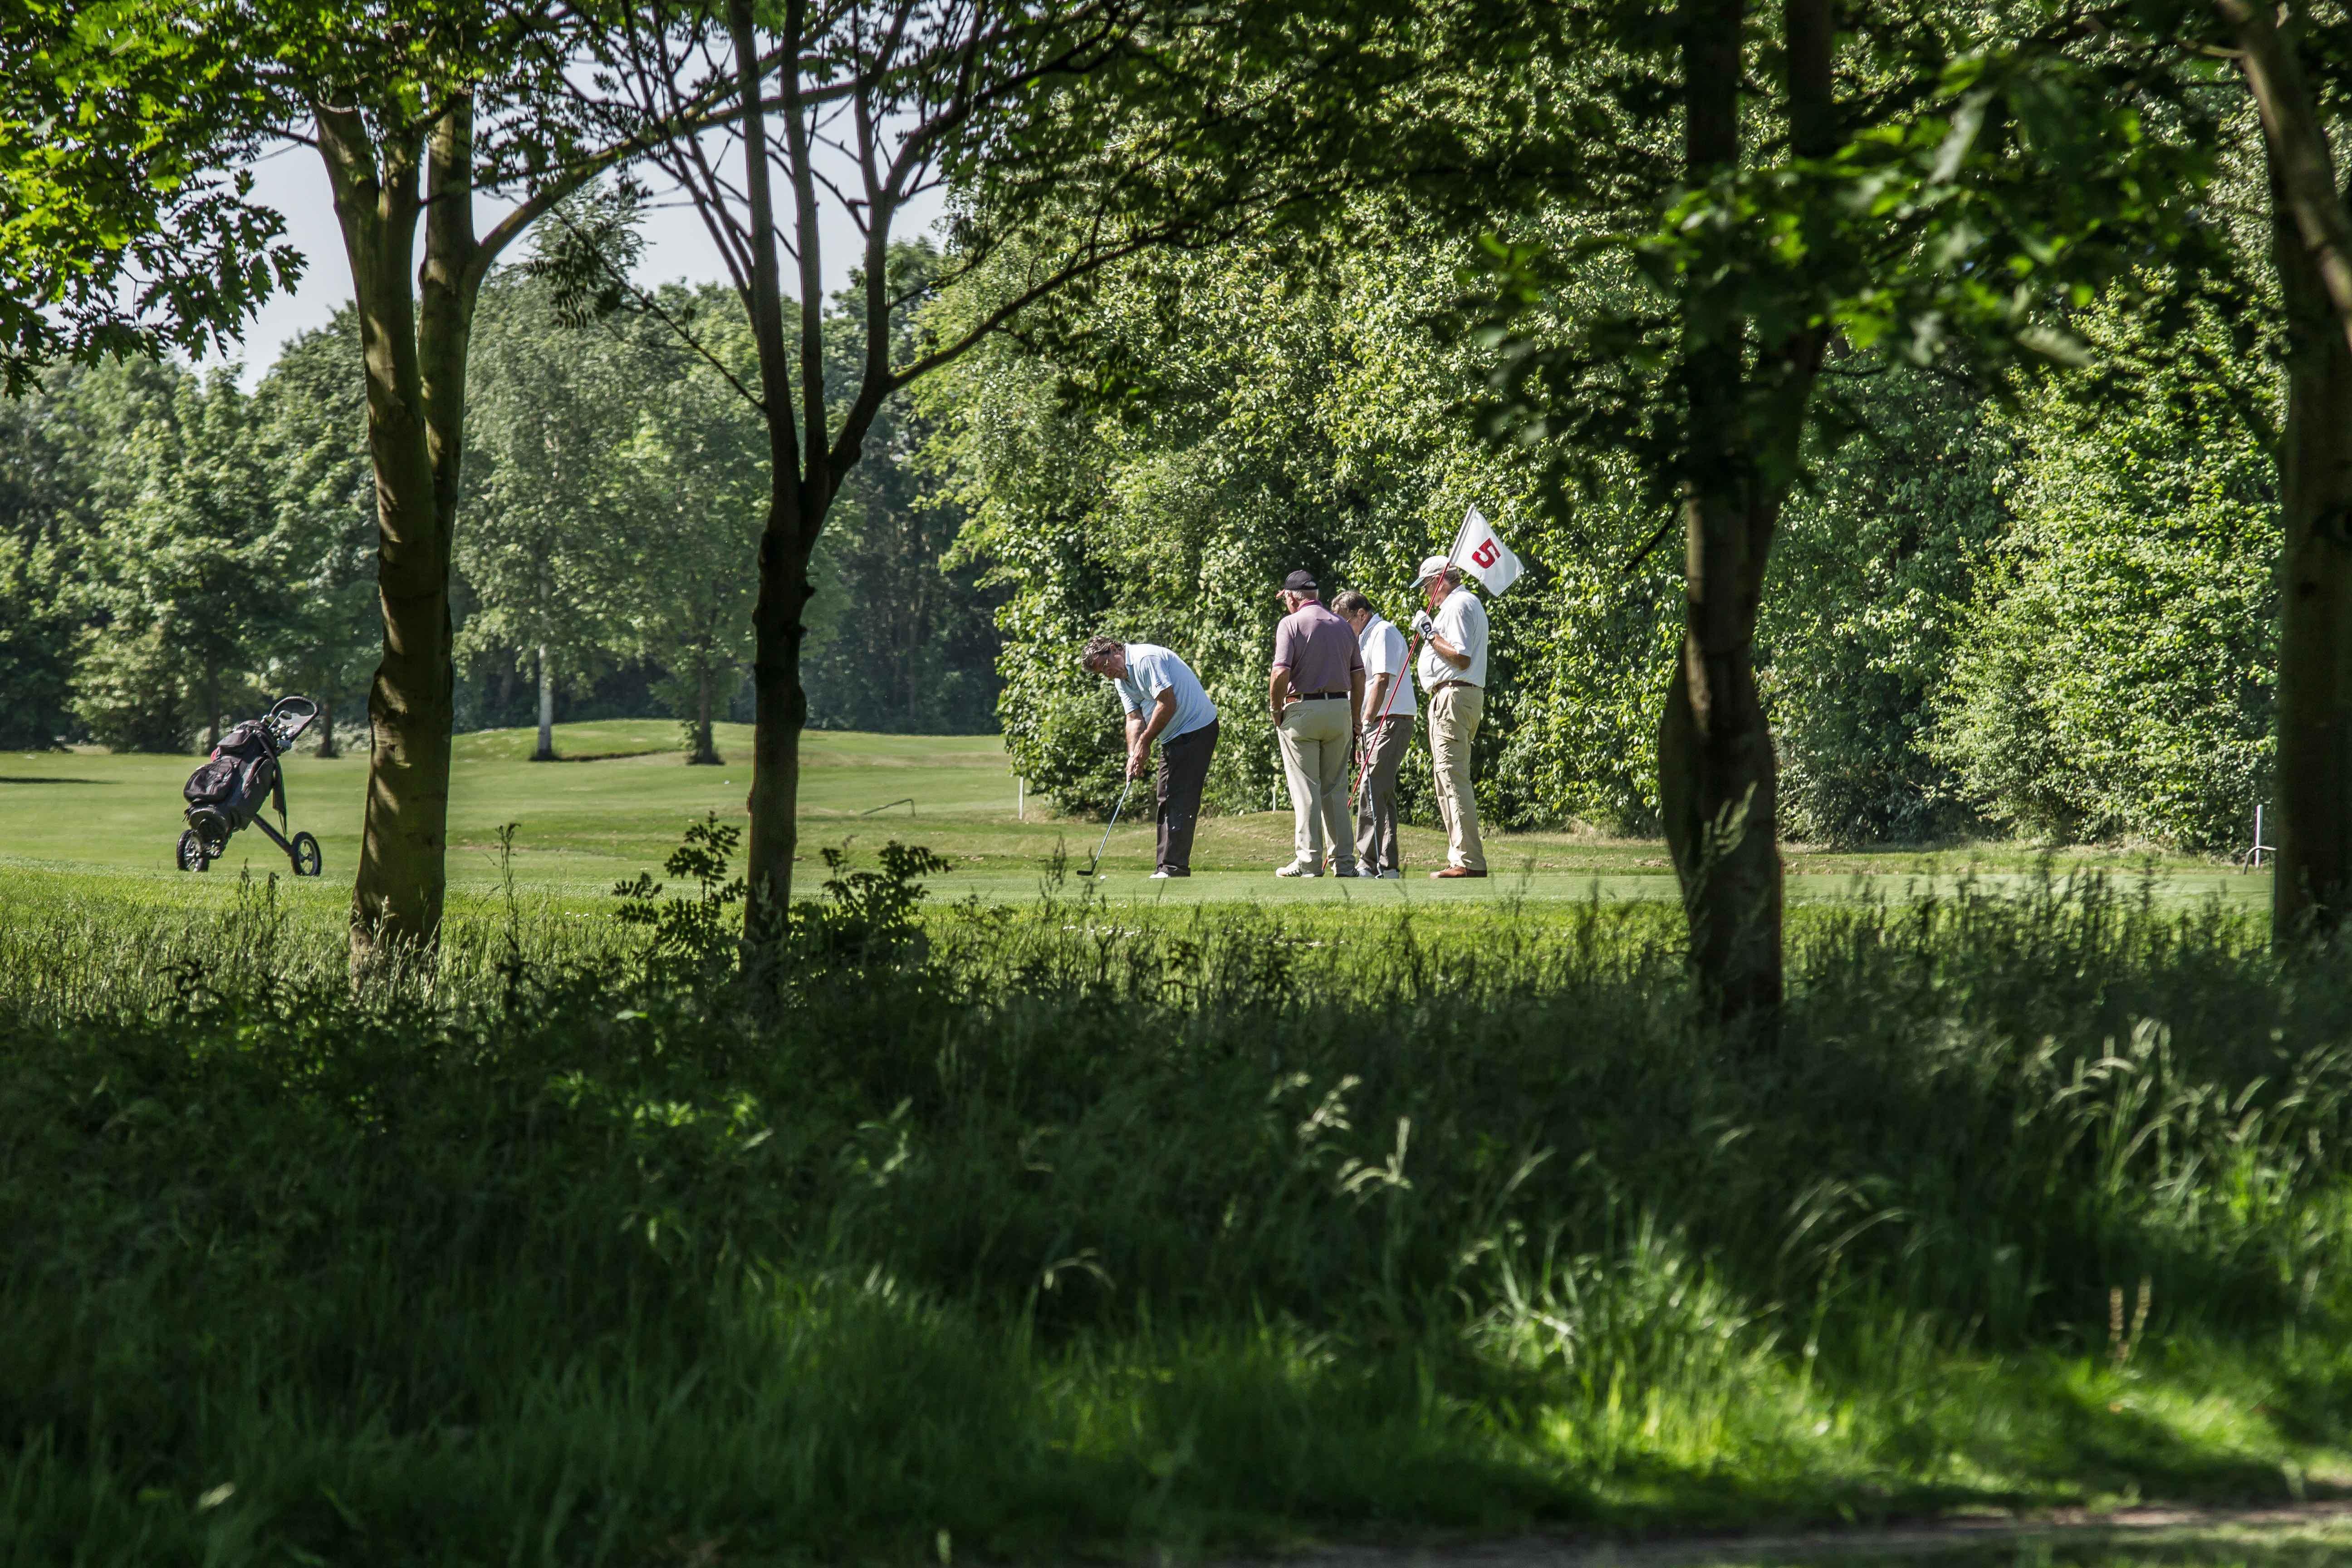 Impressionen des Golfclubs Marienfeld. (Quelle: GC Marienfeld).